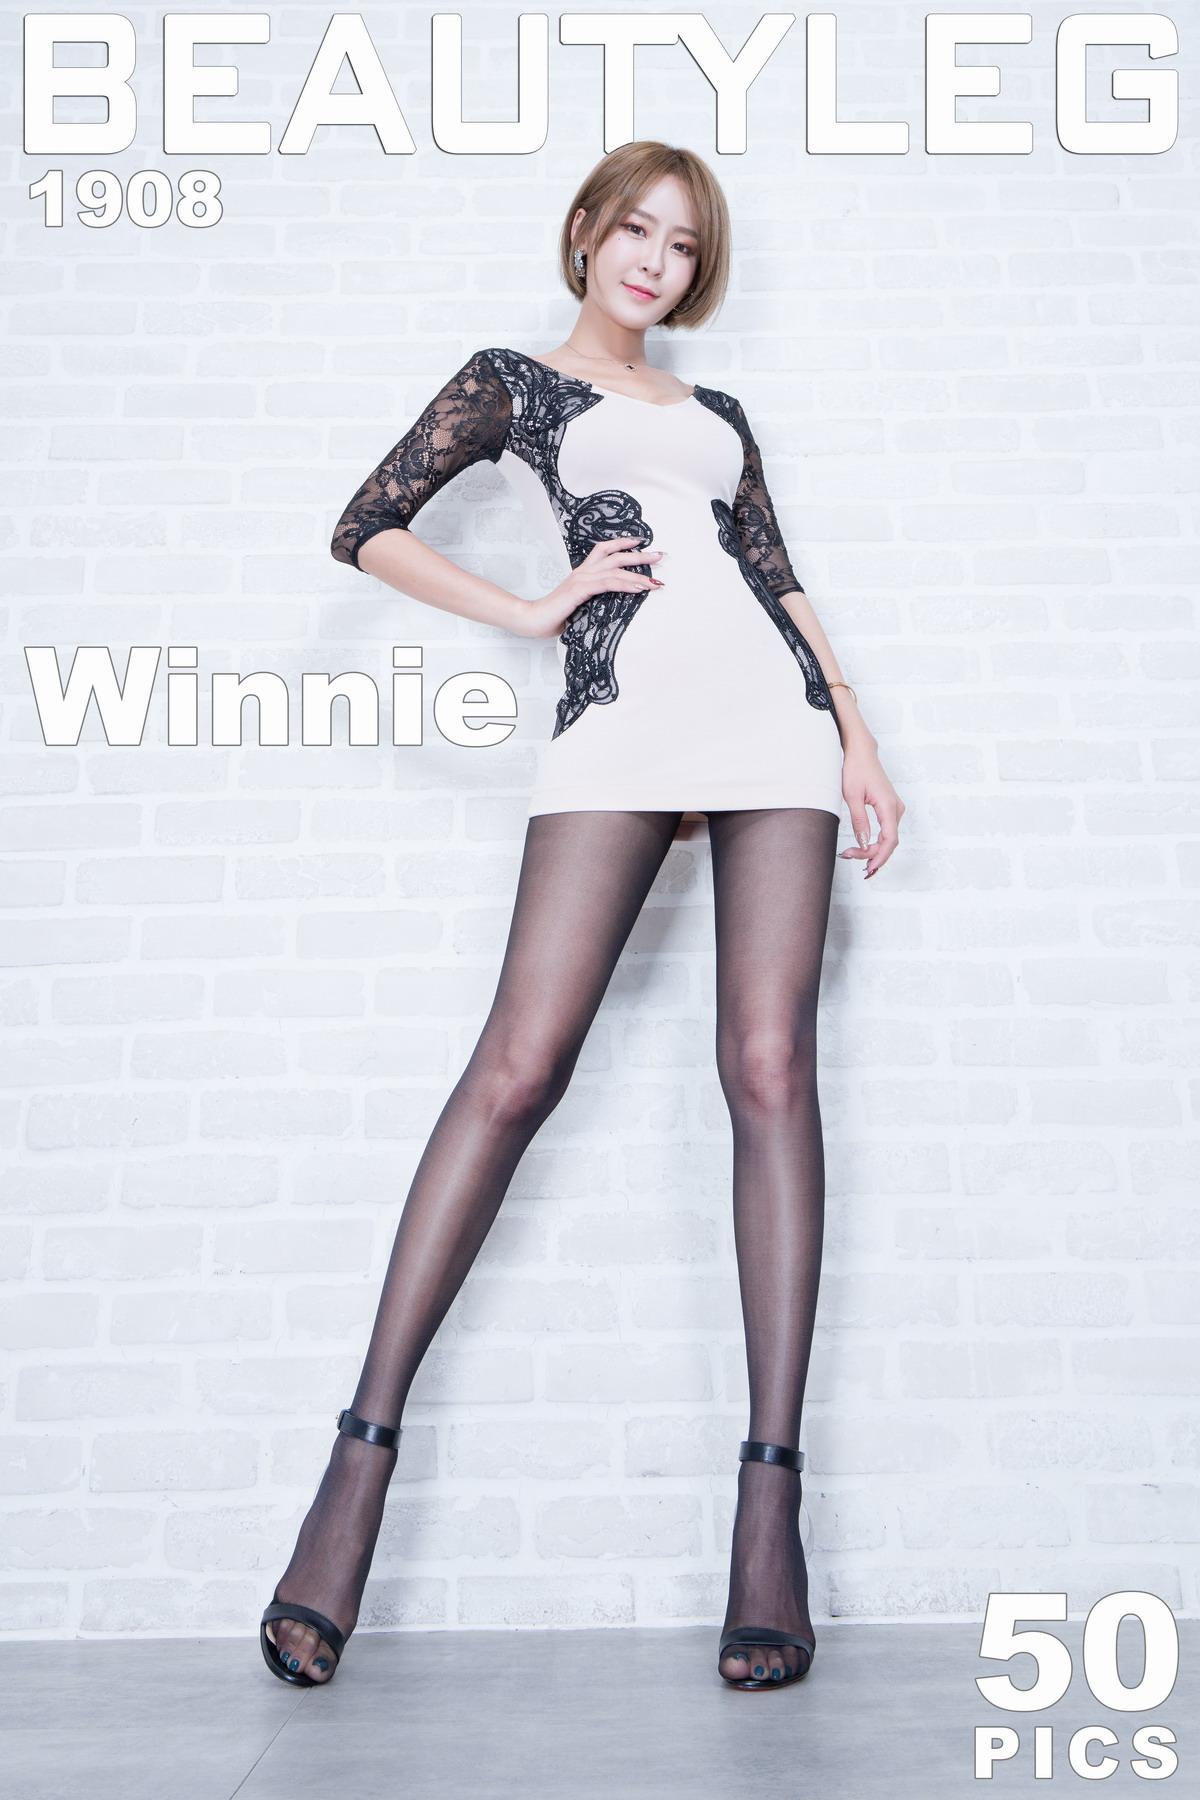 [Beautyleg]美腿写真 2020.04.15 No.1908 Winnie[/259MB]